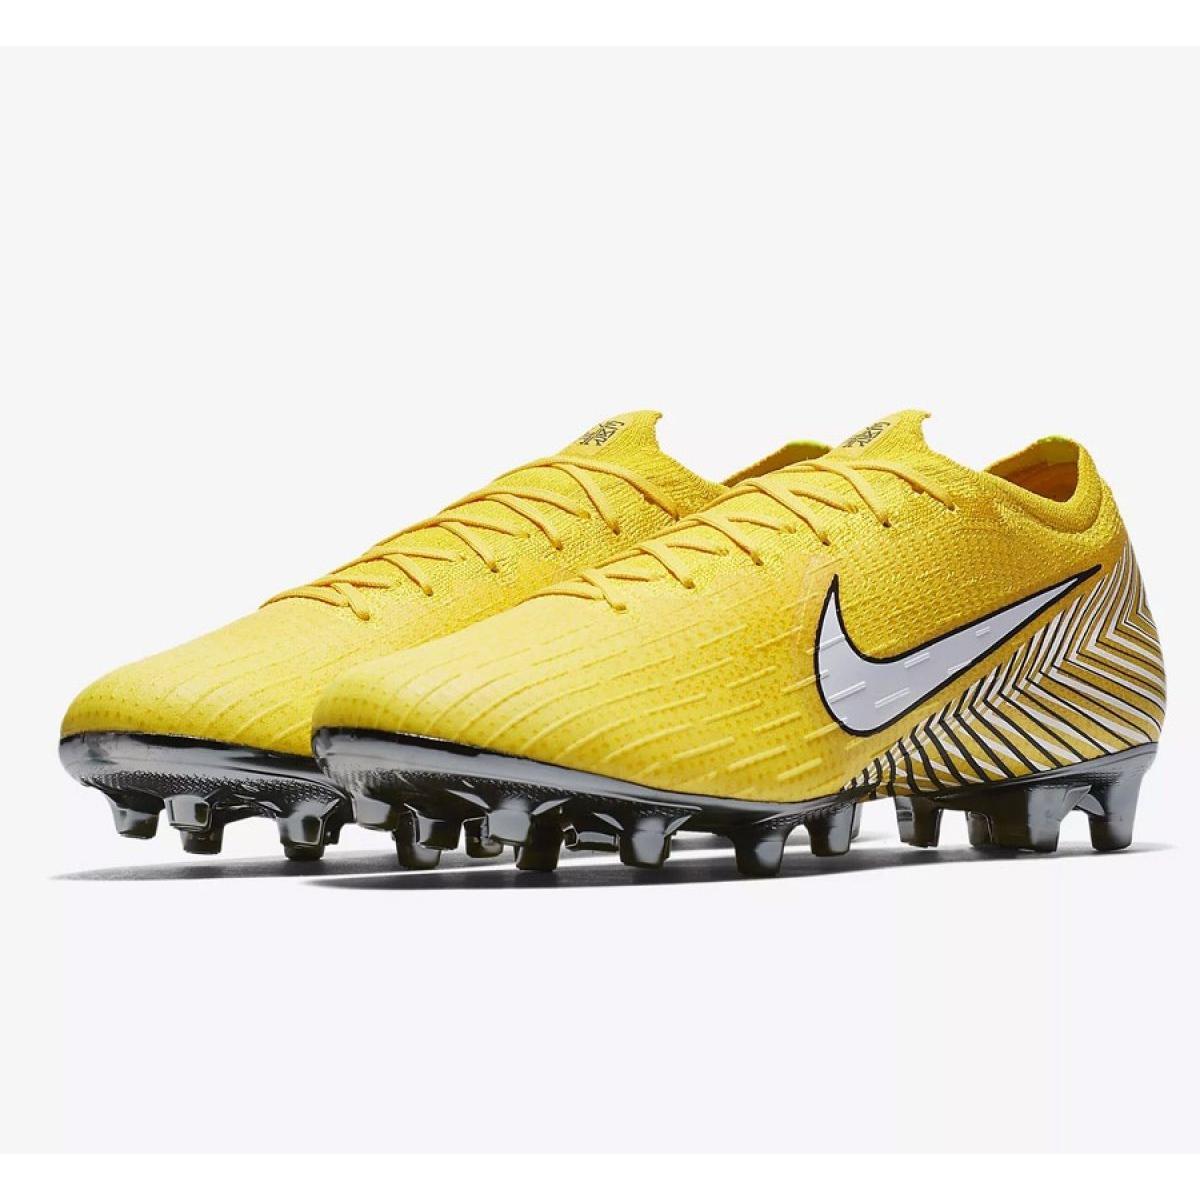 fcf86594 Nike Mercurial Vapor 12 Elite Neymar AG-Pro M AO3128-710 Football Shoes  picture